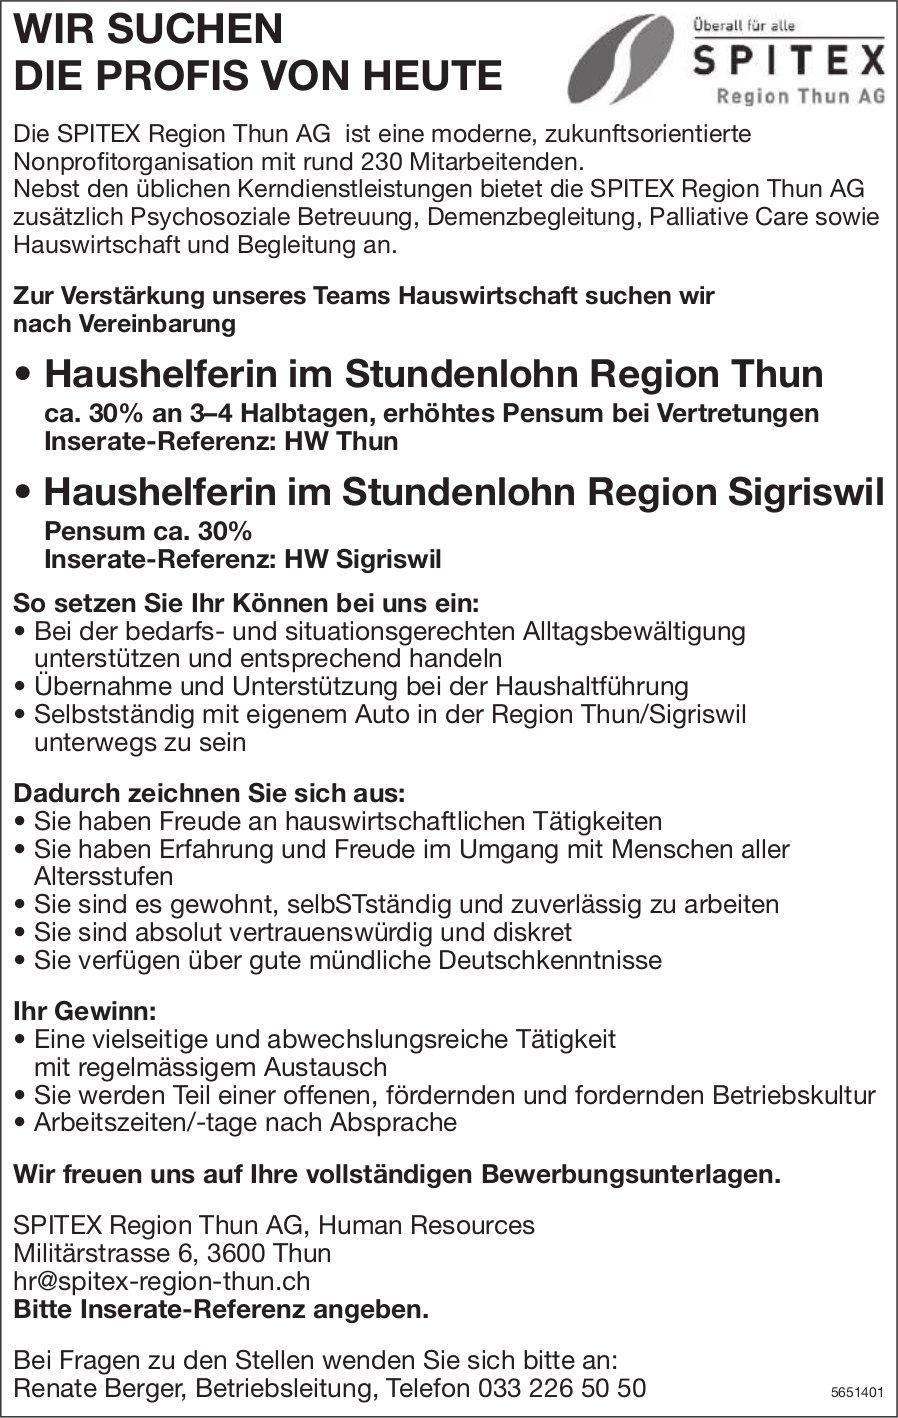 Haushelferin im Stundenlohn Region Thun & Region Sigriswil, Spitex Region Thun AG, gesucht